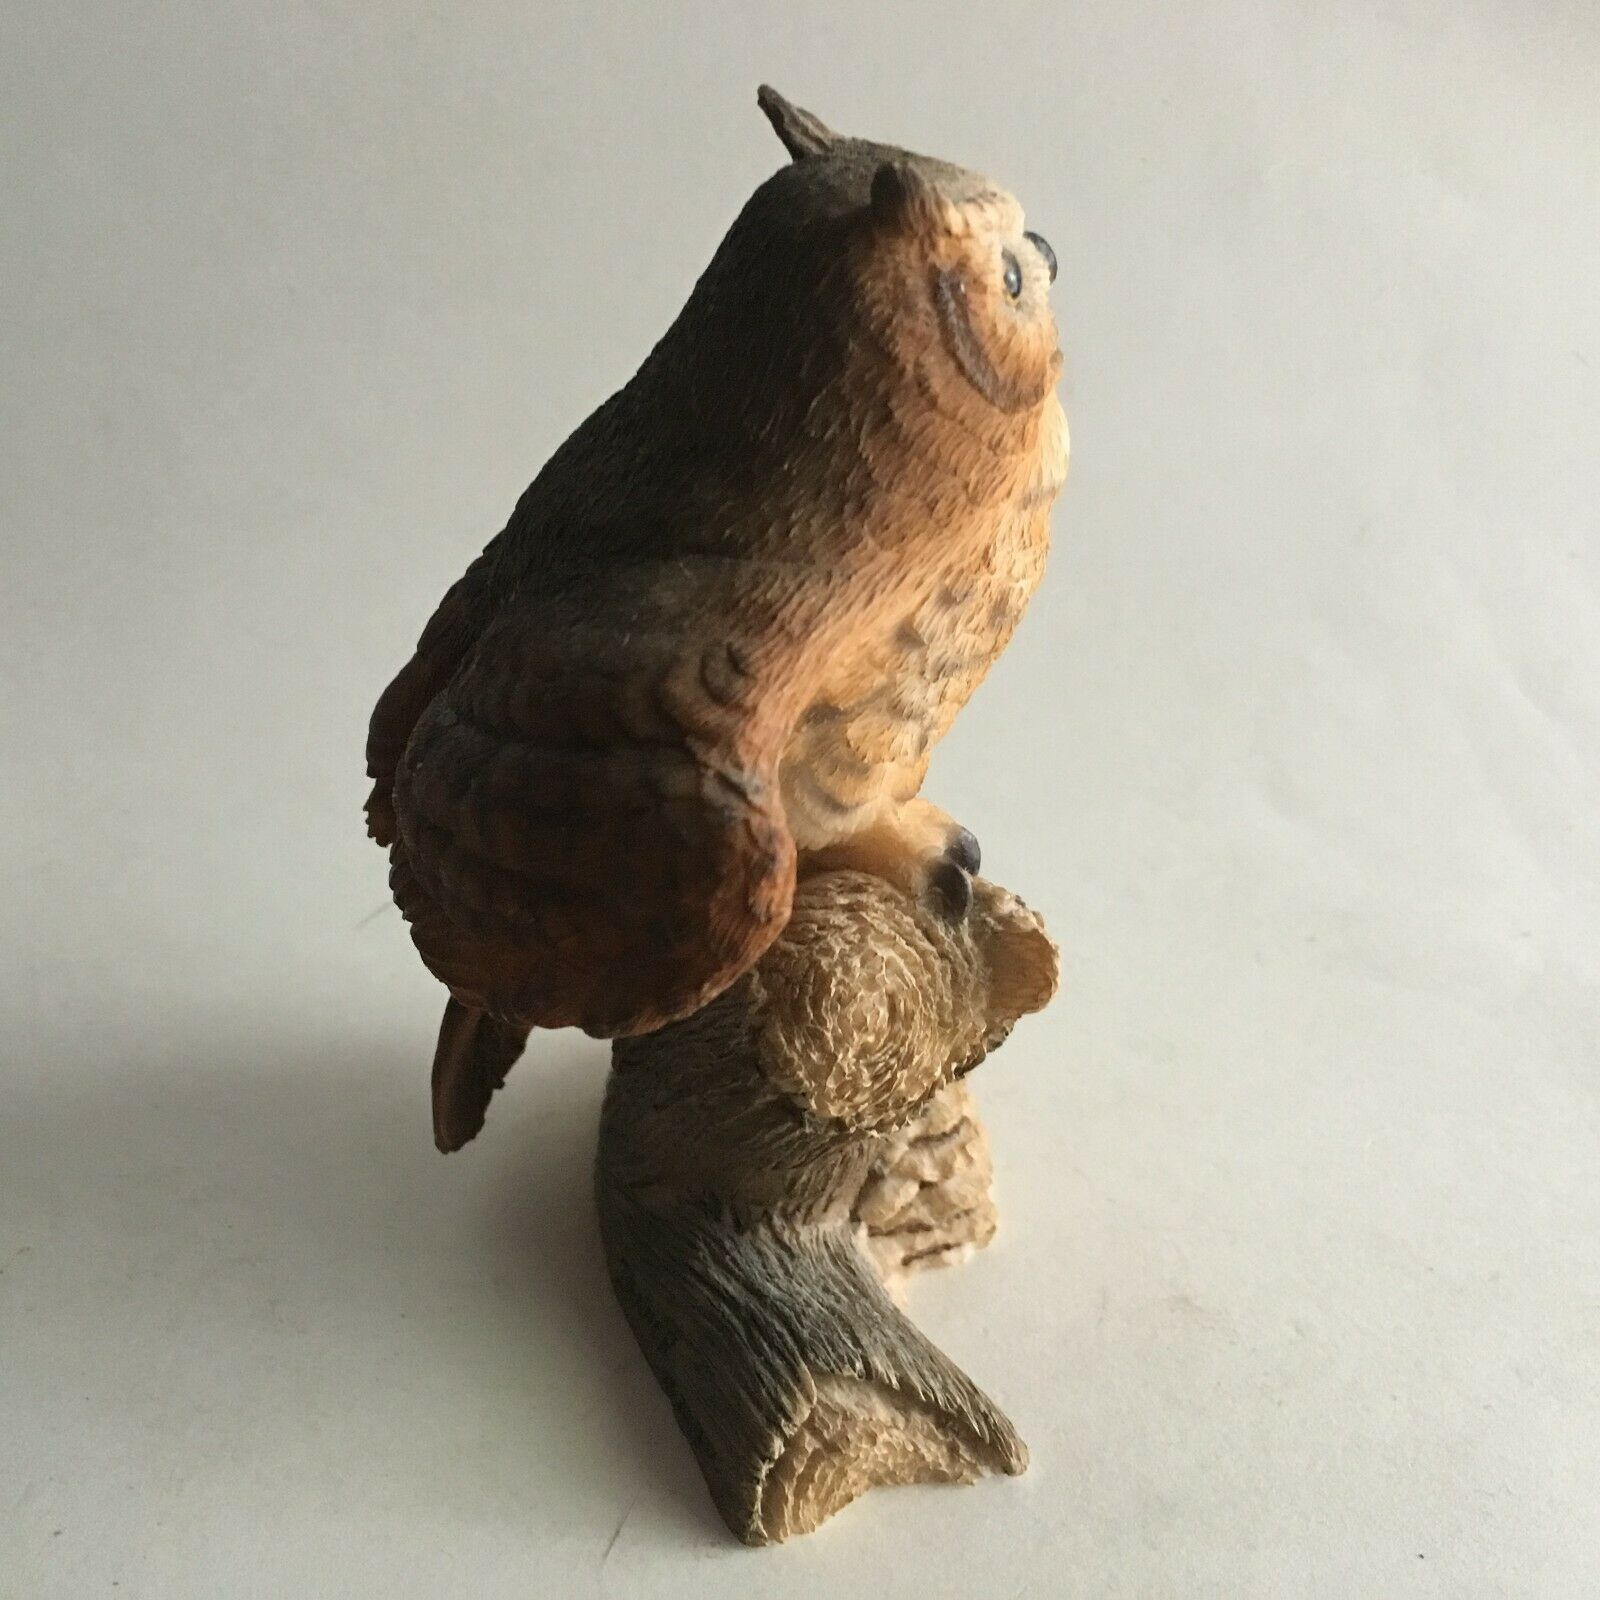 "Vintage Owl Bark Branch Ceramic Figurine Statue Collectible 5""X4X3"" Mid Century"